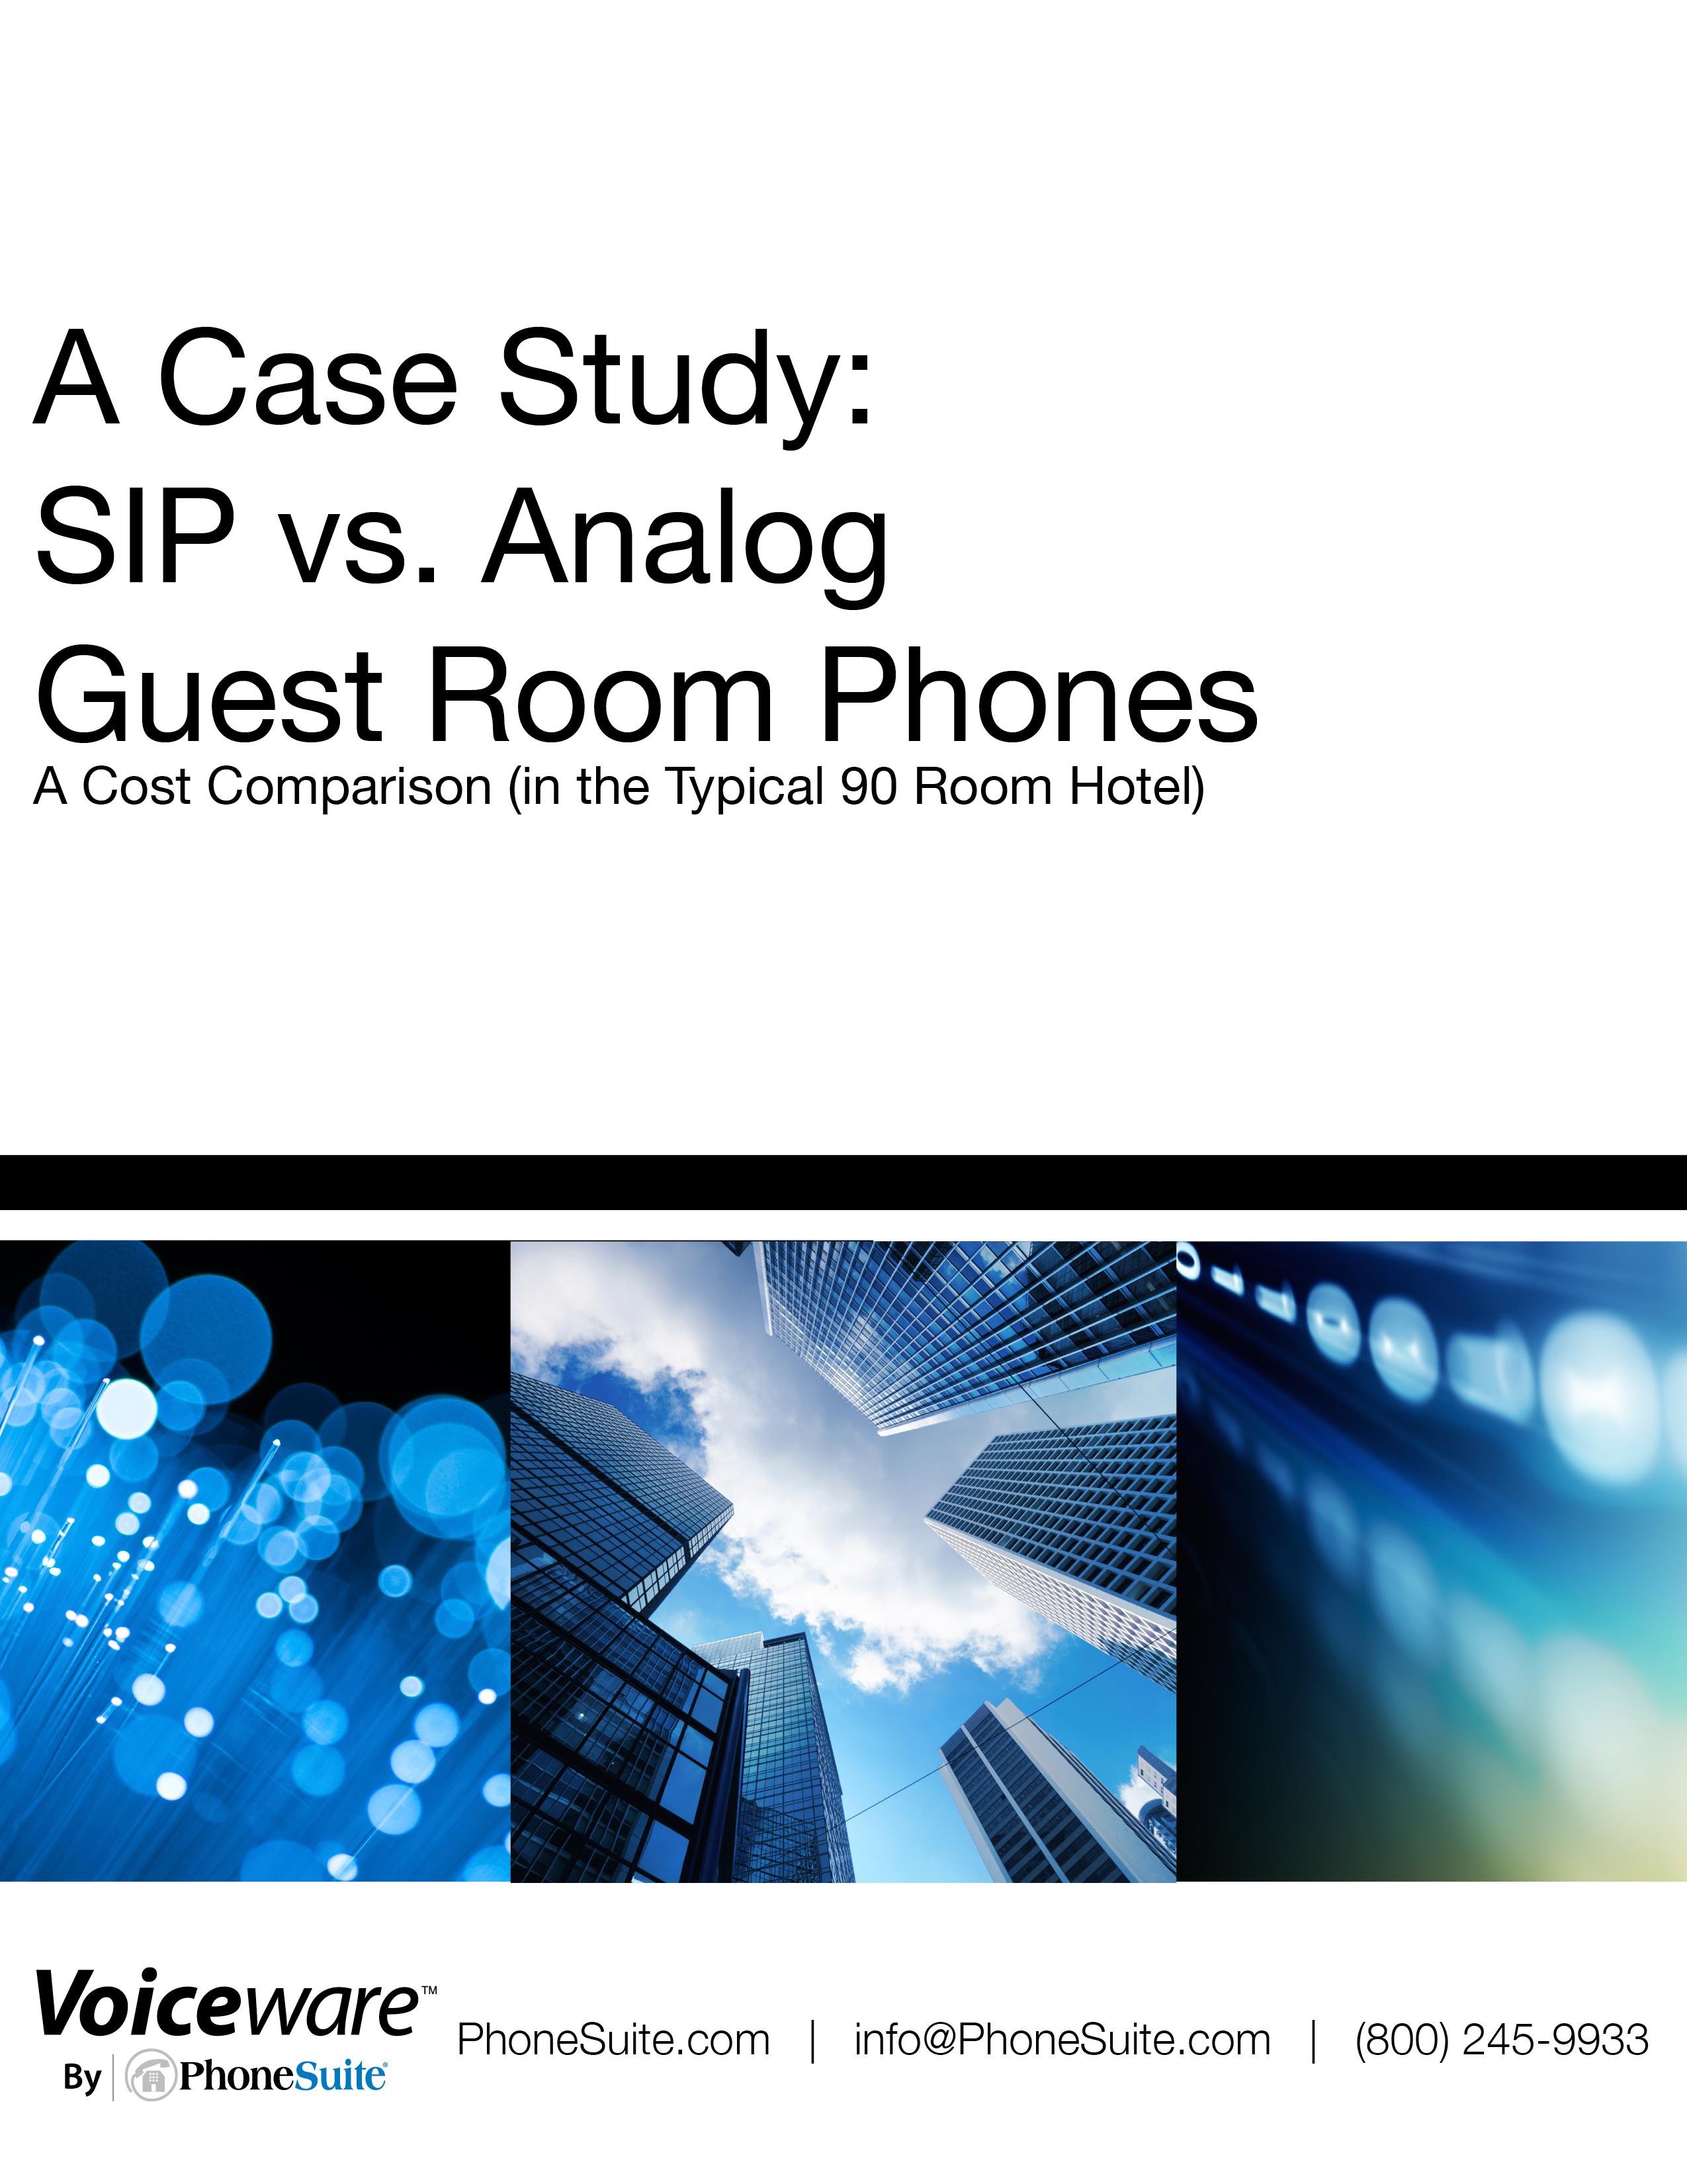 CASE STUDY: SIP vs. Analog Guest Room Phones